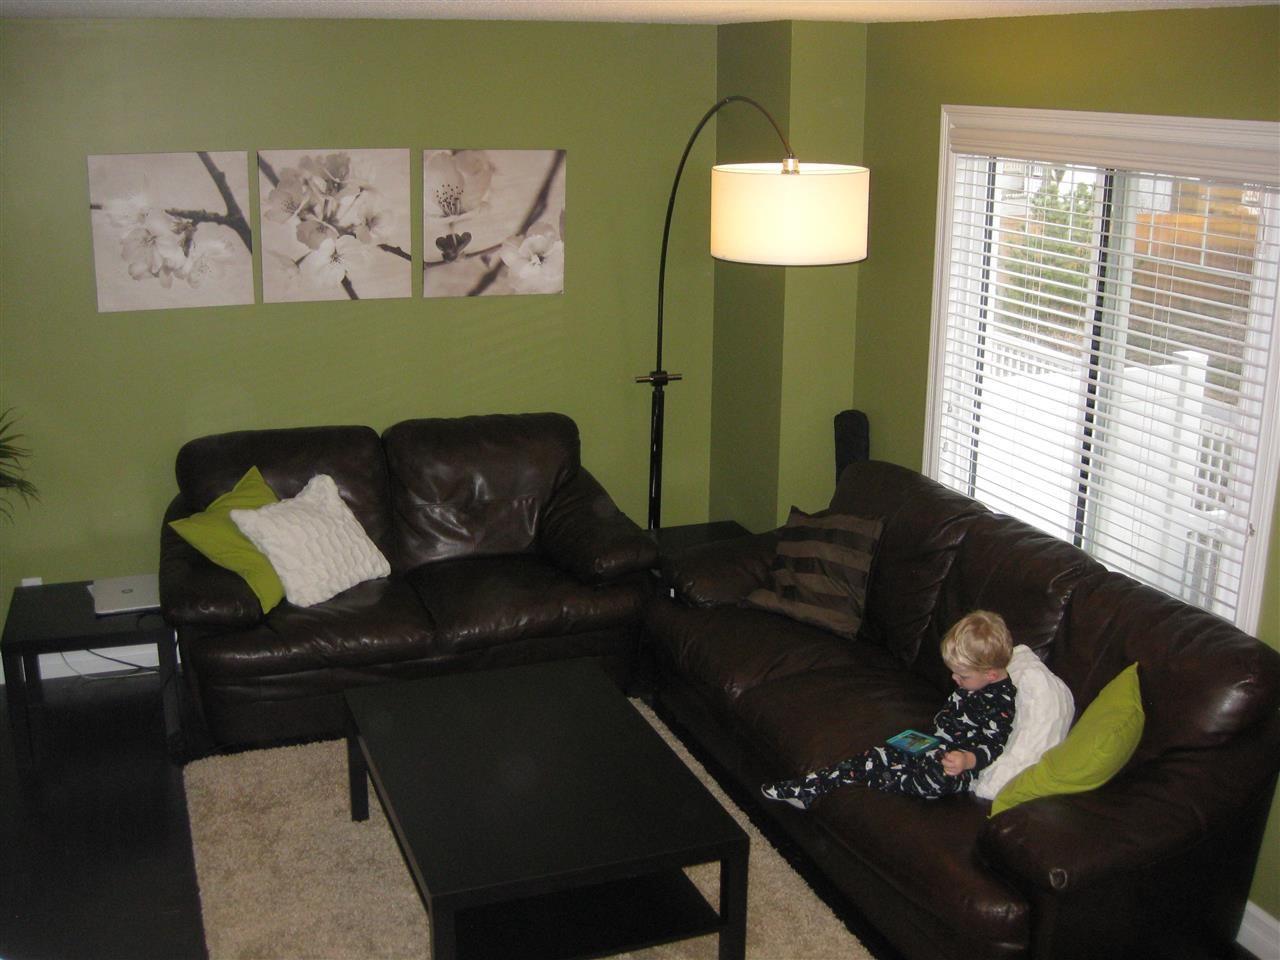 Photo 6: Photos: #41 3625 144 AV NW in Edmonton: Zone 35 Townhouse for sale : MLS®# E4016087